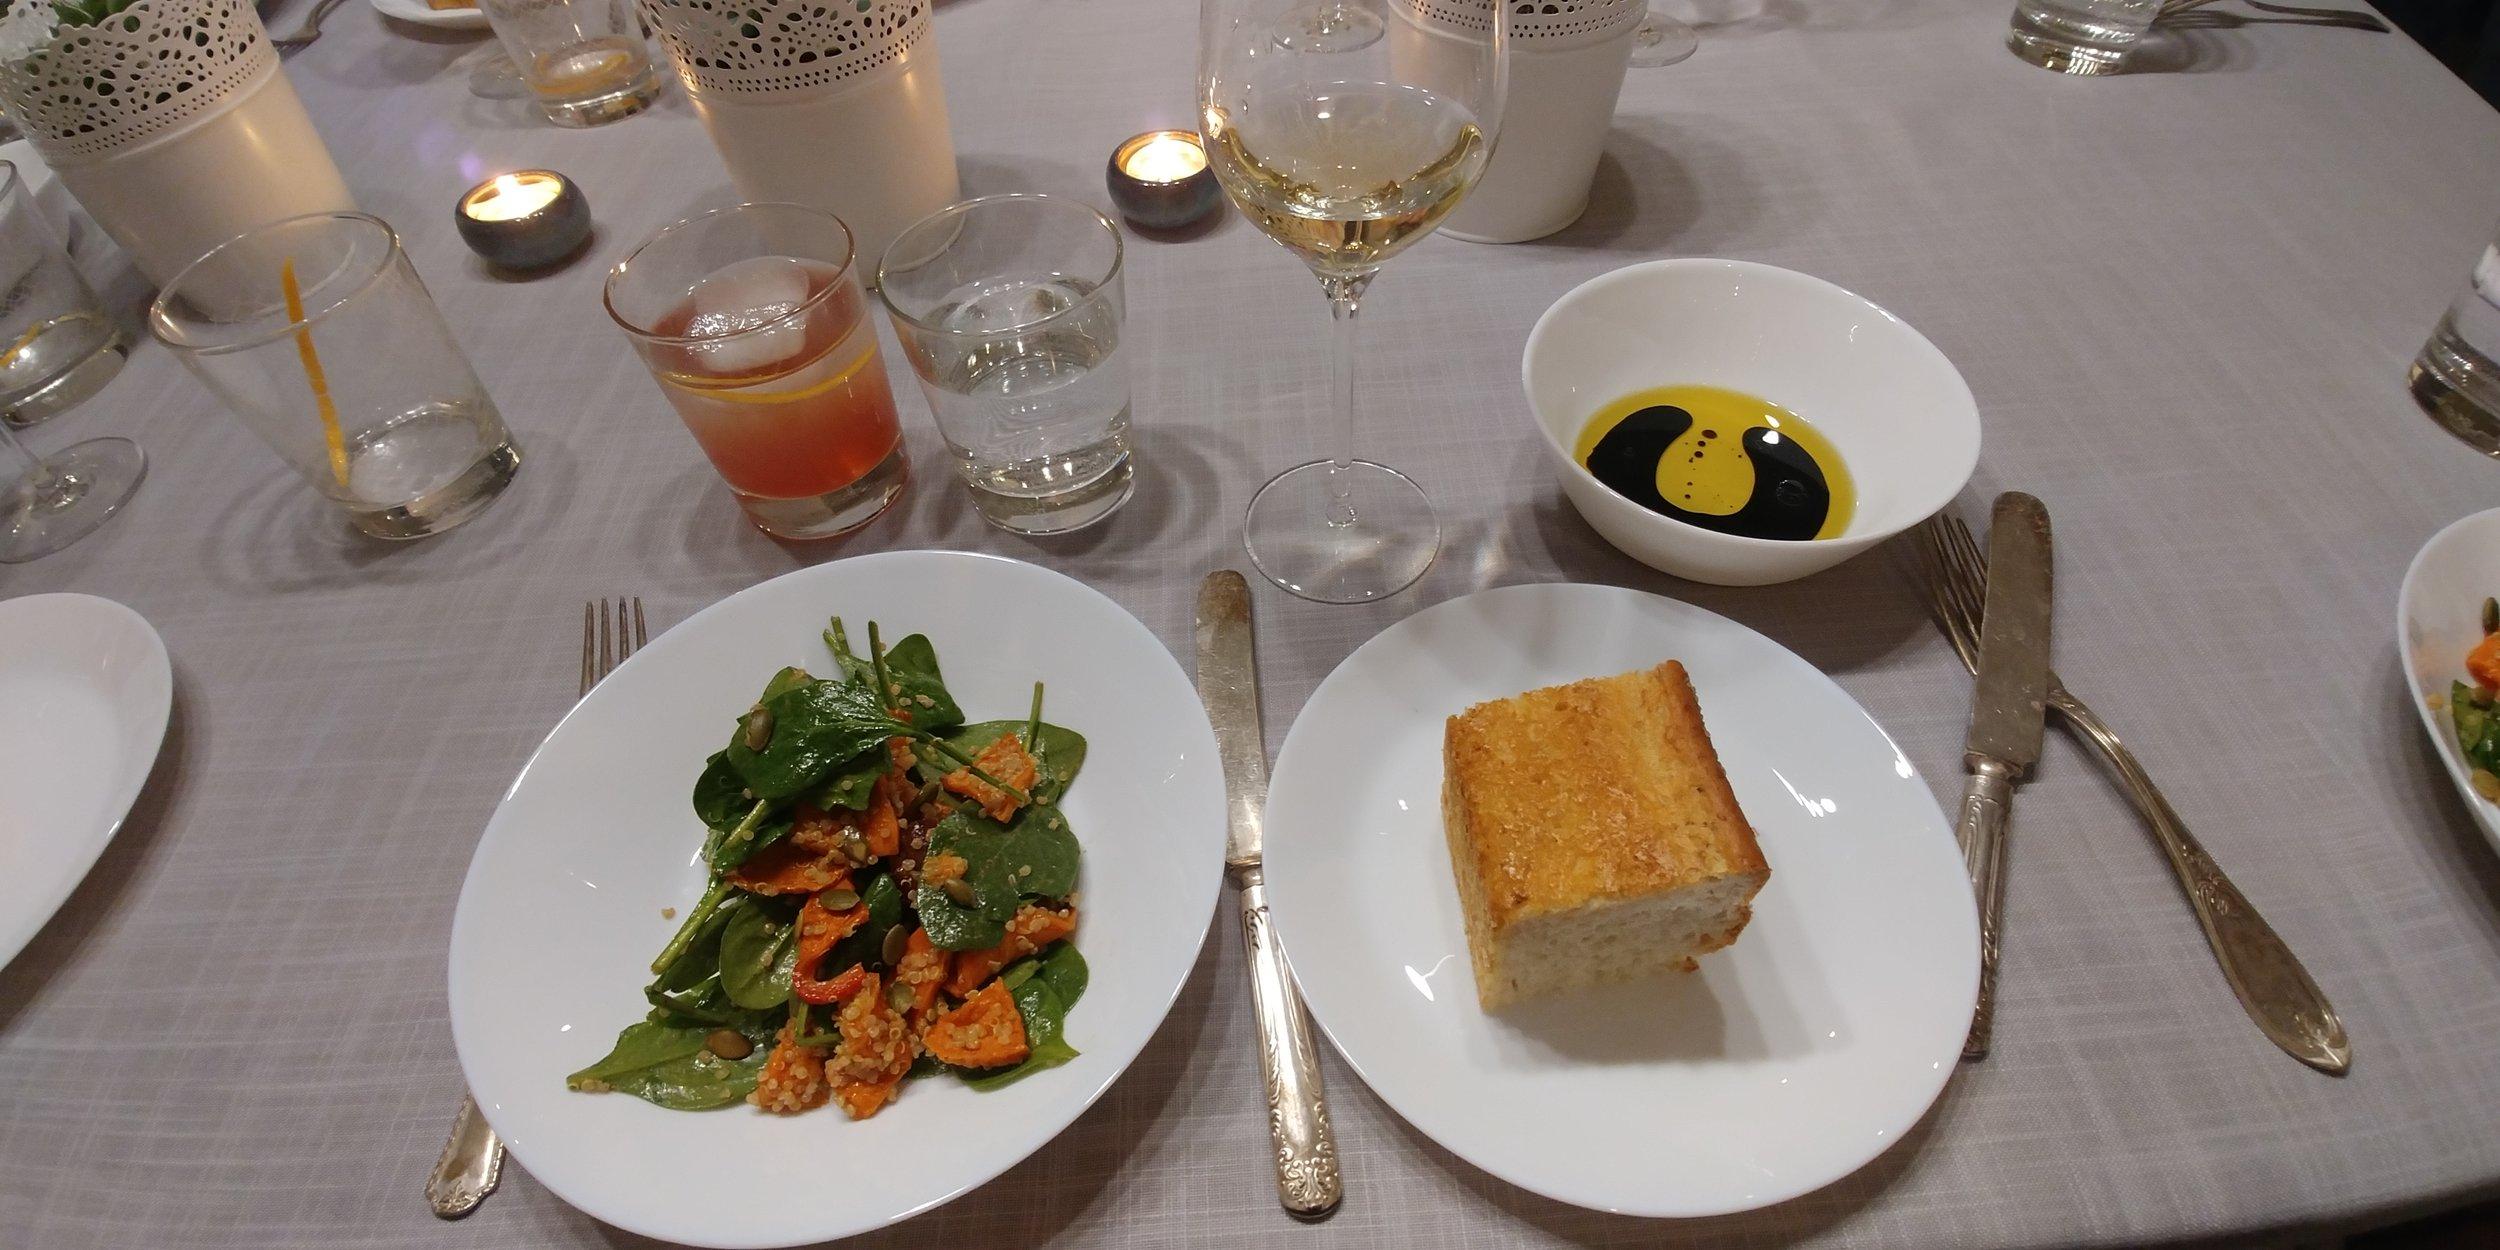 Spinach salad, focaccia bread